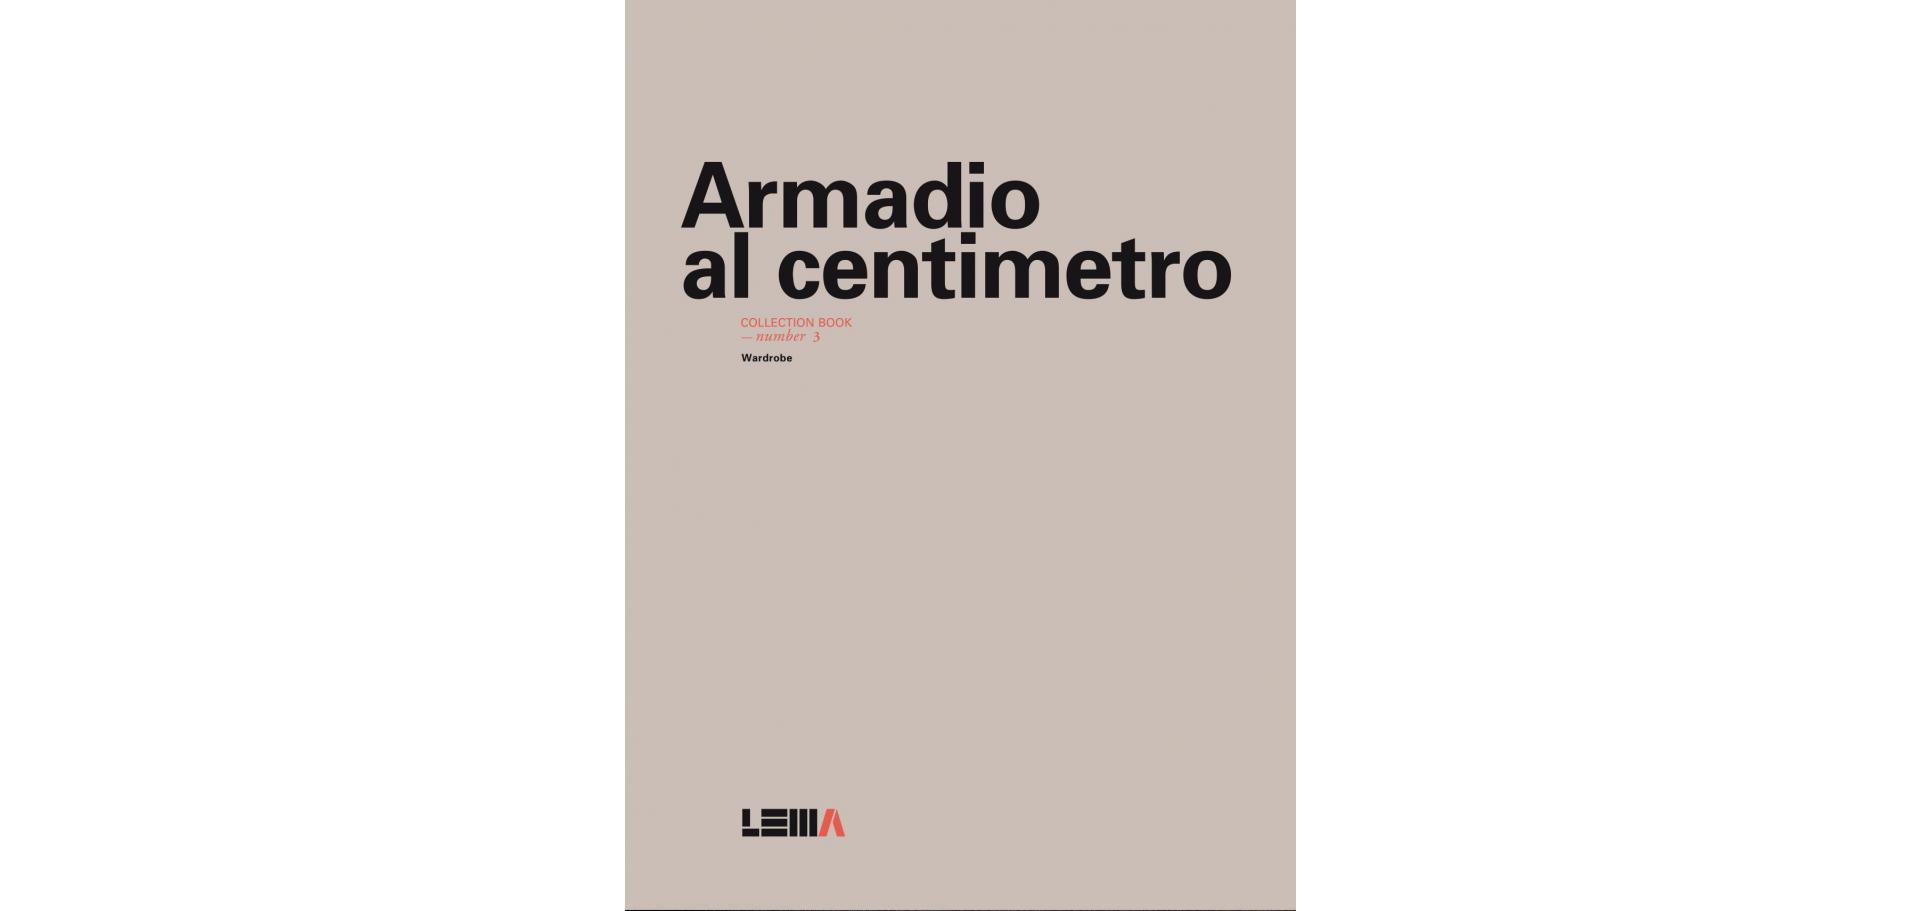 Armadi al centimetro - book 3